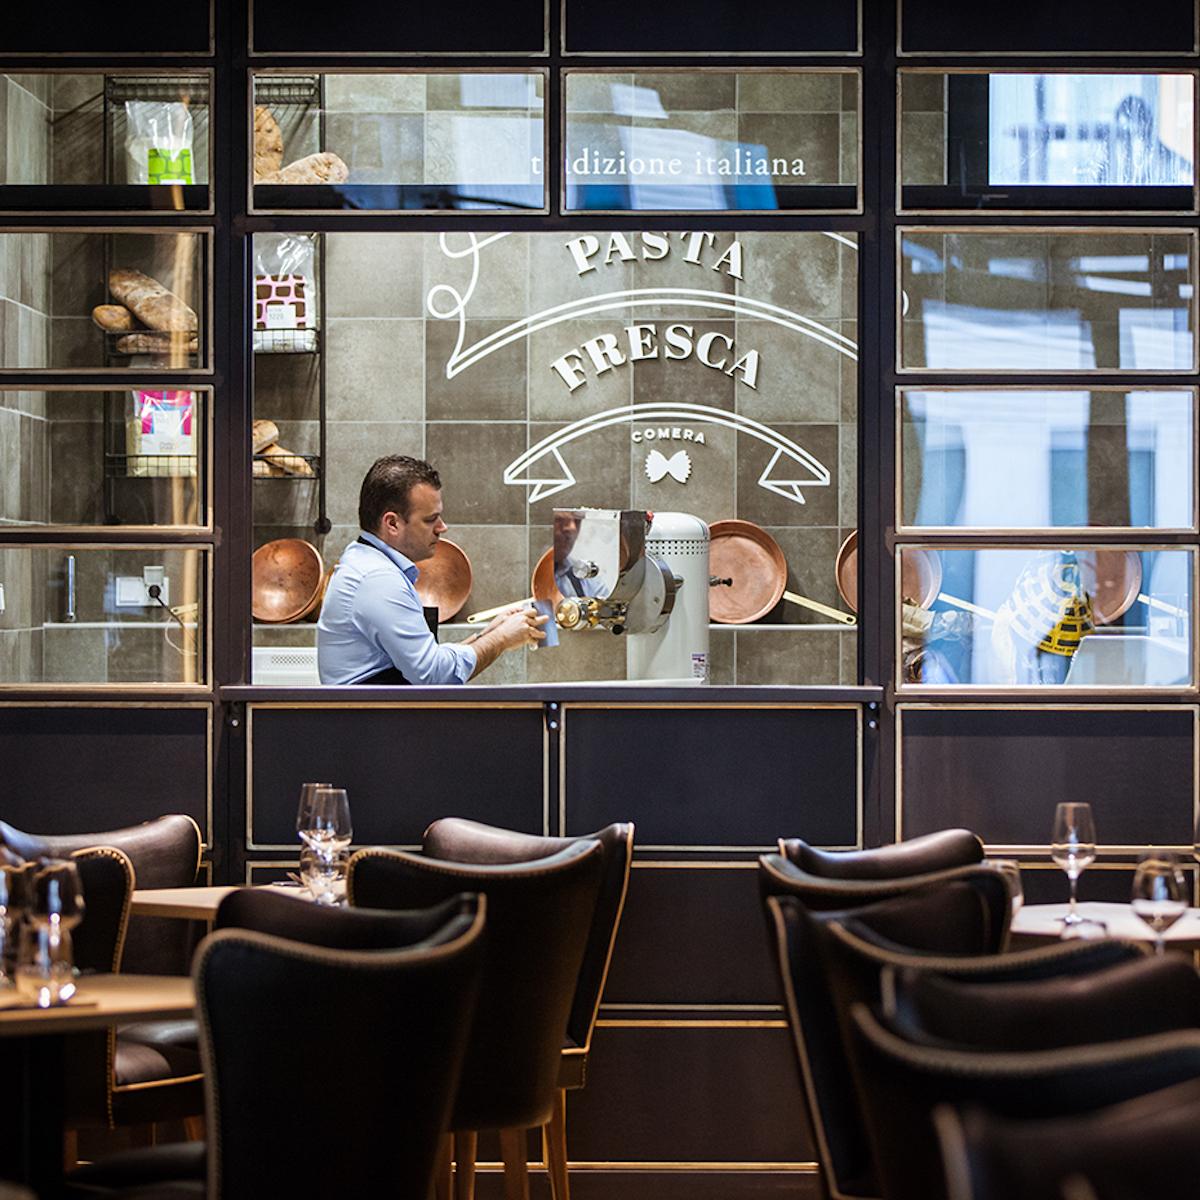 Restaurant Comera München_Pasta Fresca